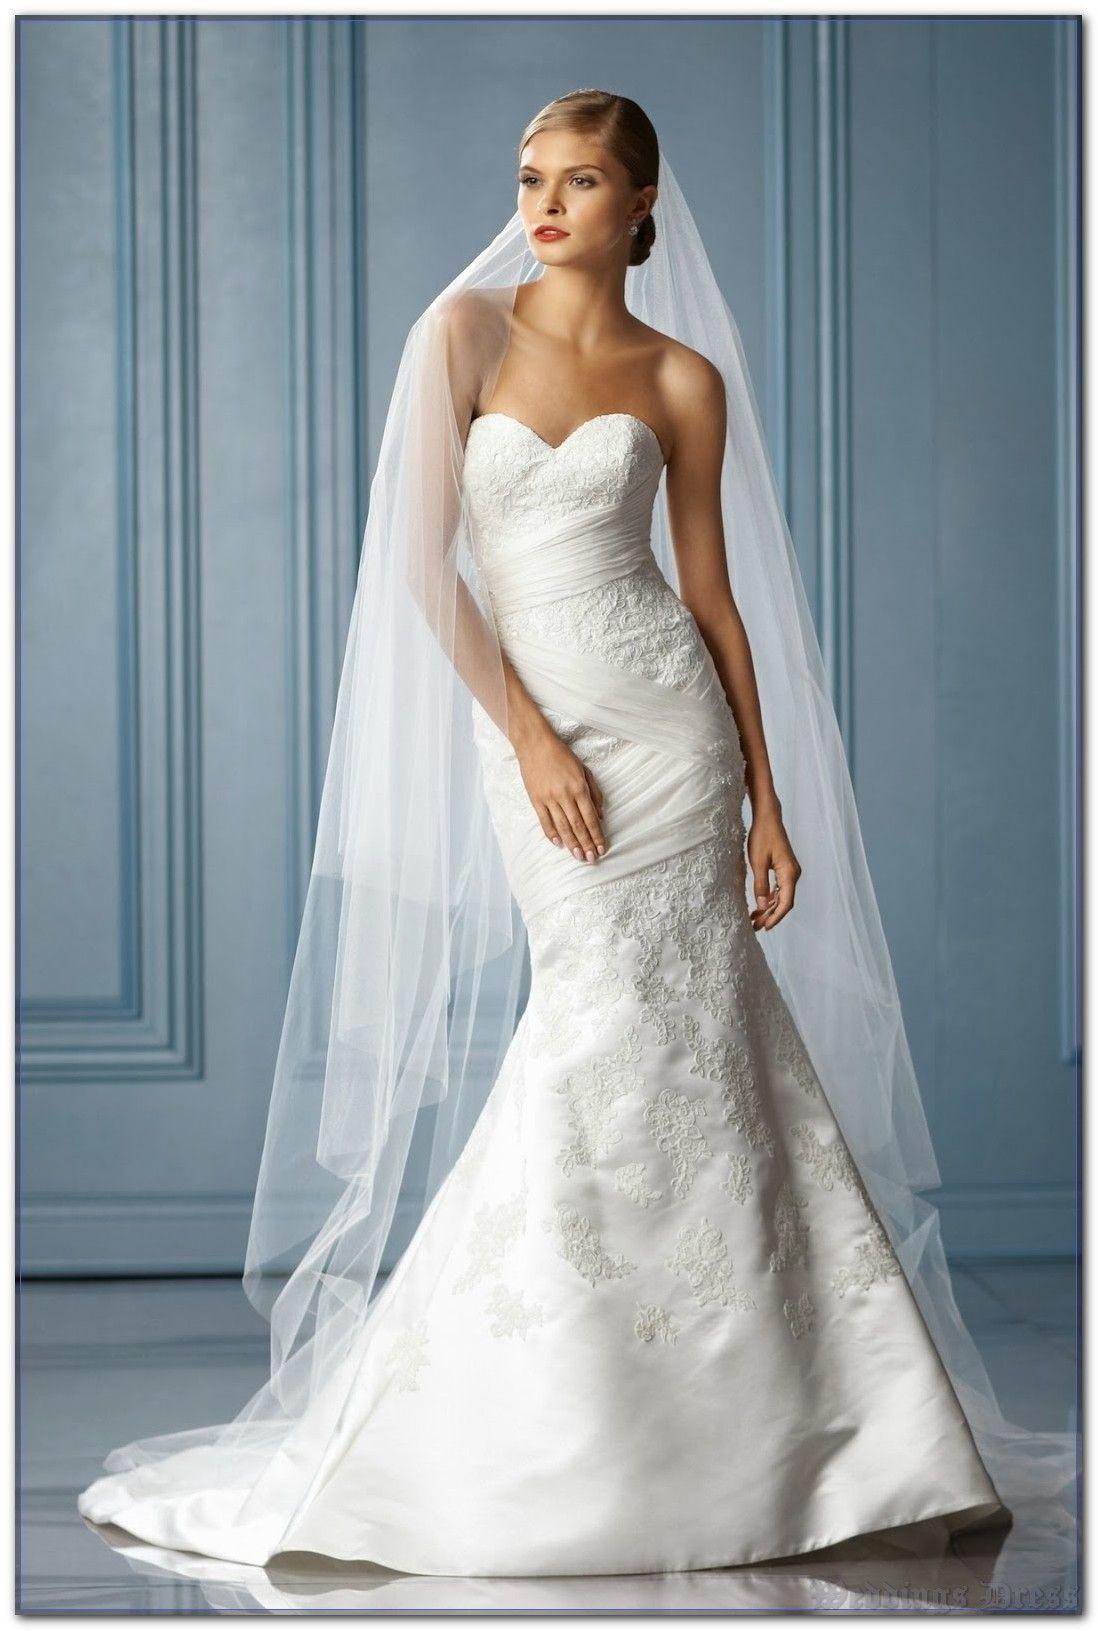 The Weddings Dress That Wins Customers